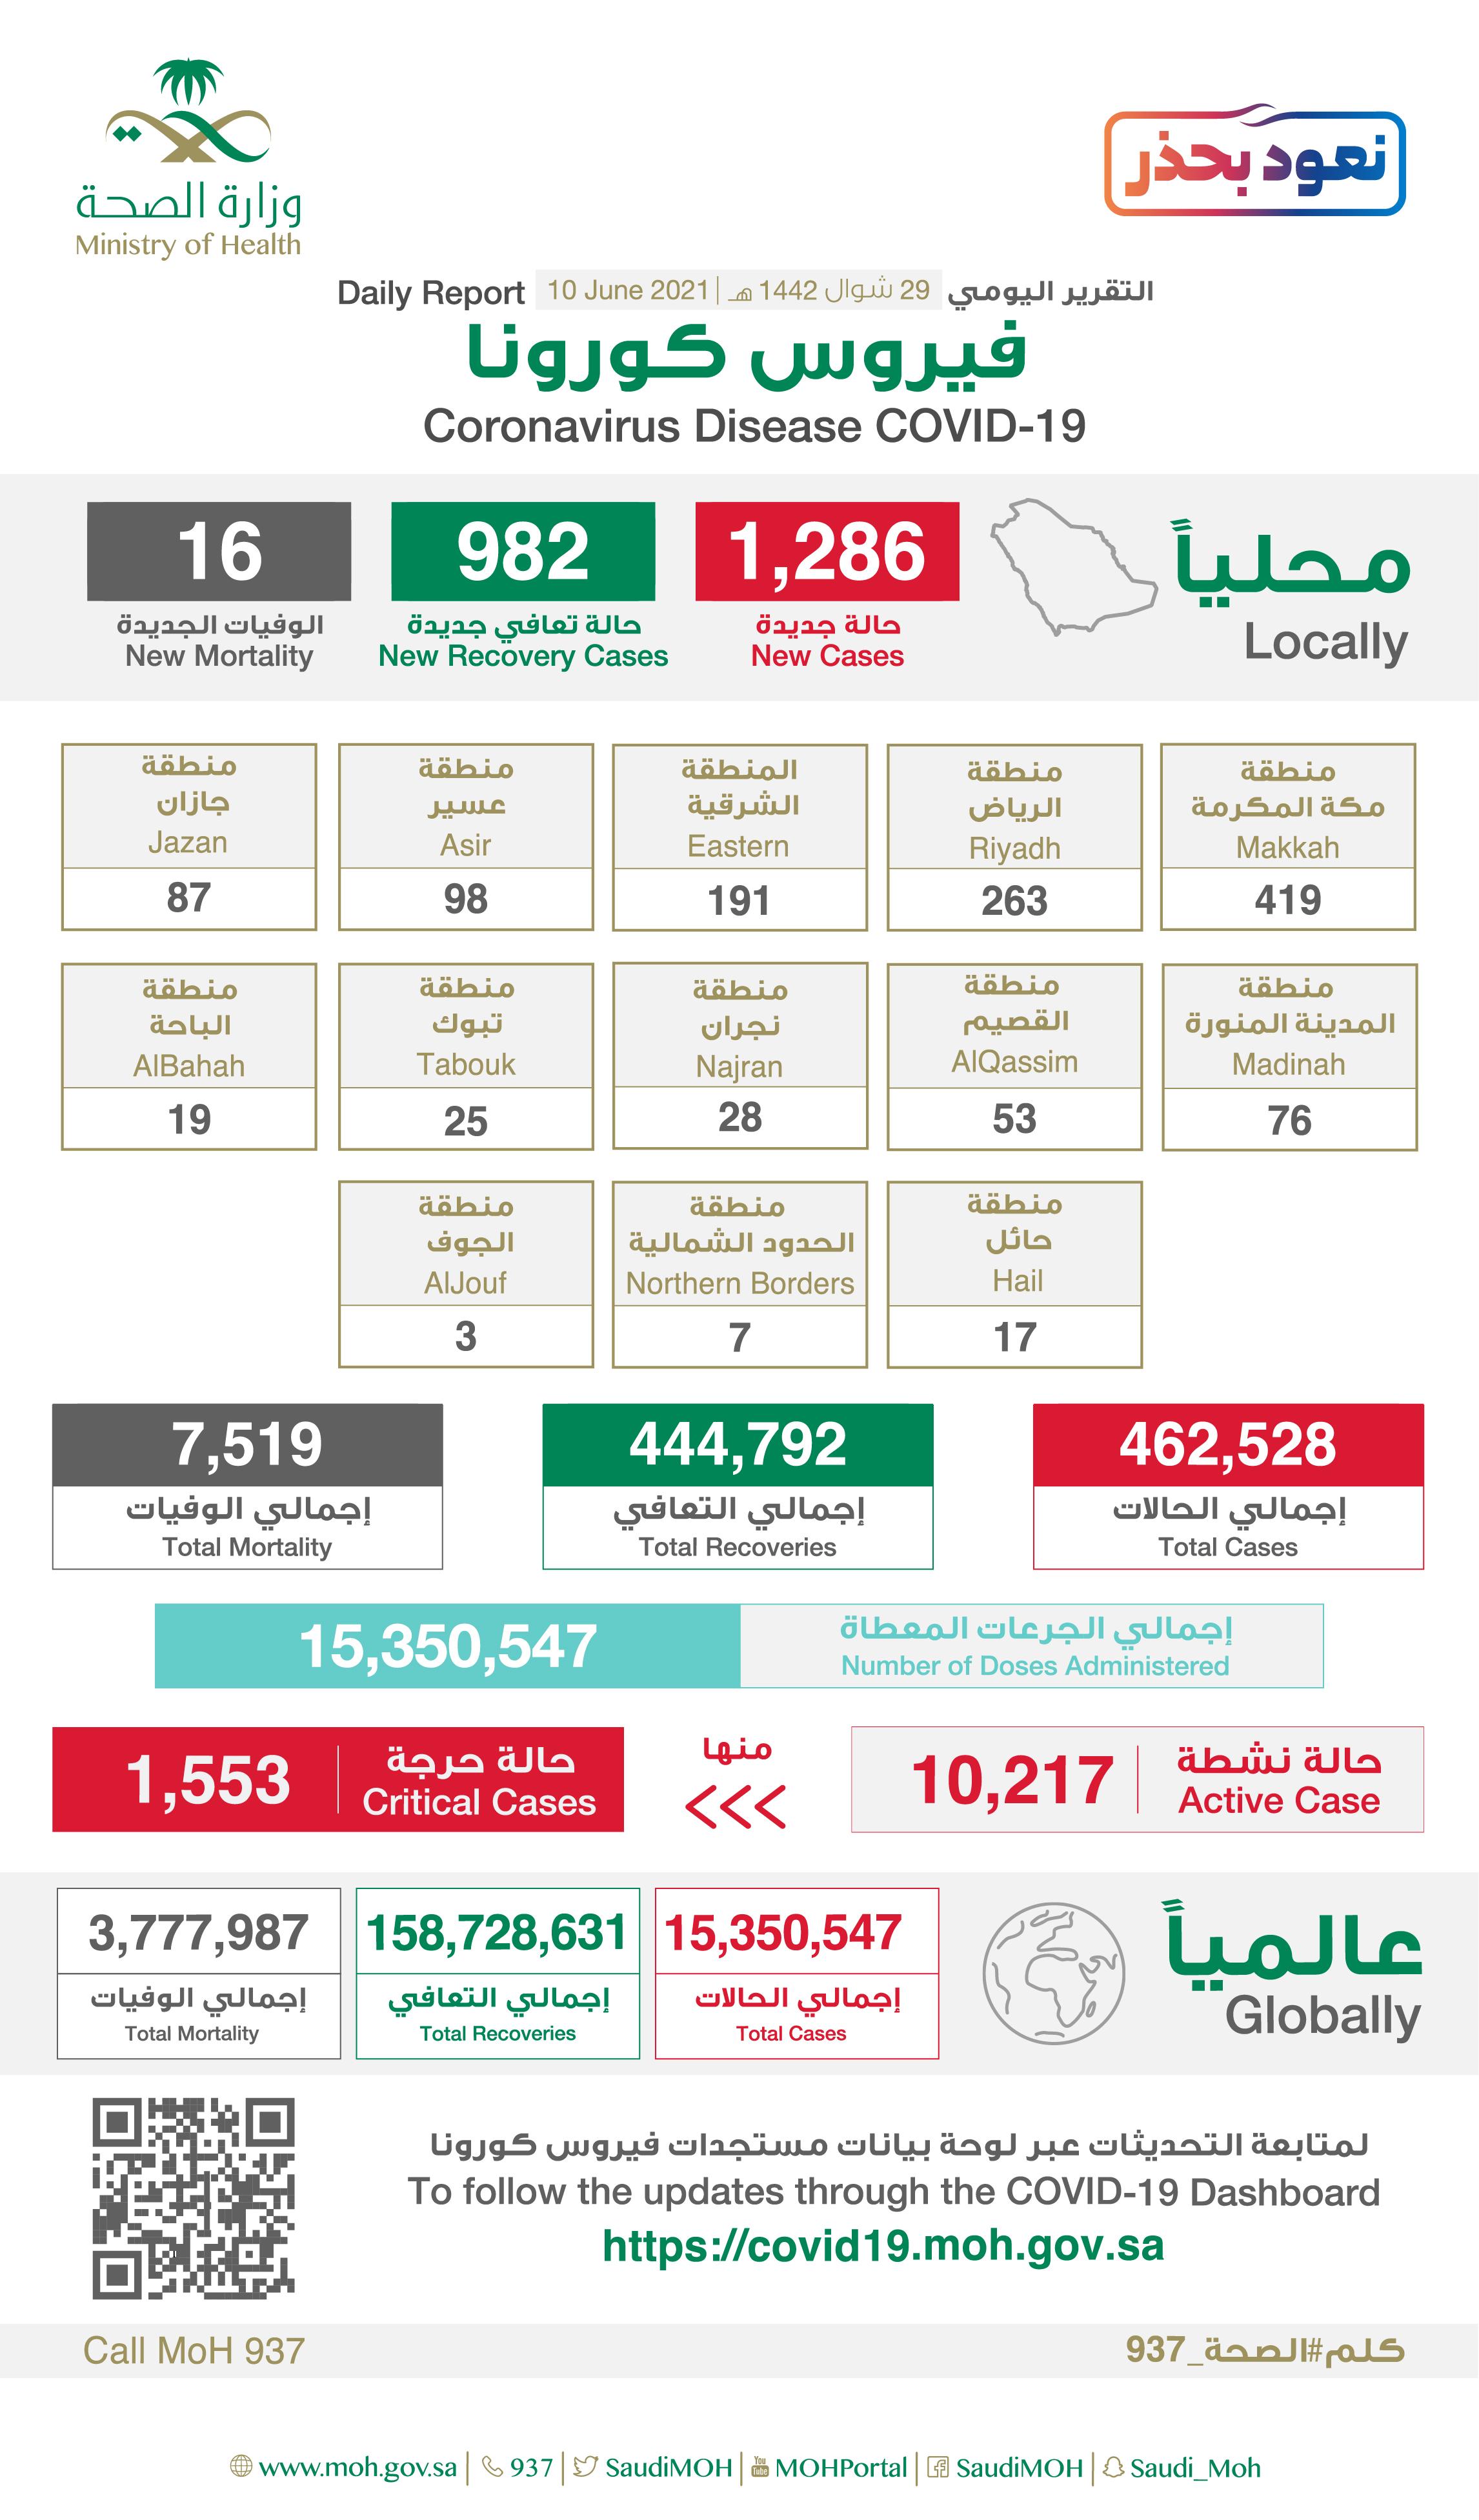 Saudi Arabia Coronavirus : Total Cases :462,528 , New Cases : 1,286 , Cured : 444,792 , Deaths: 7,519, Active Cases : 10,217